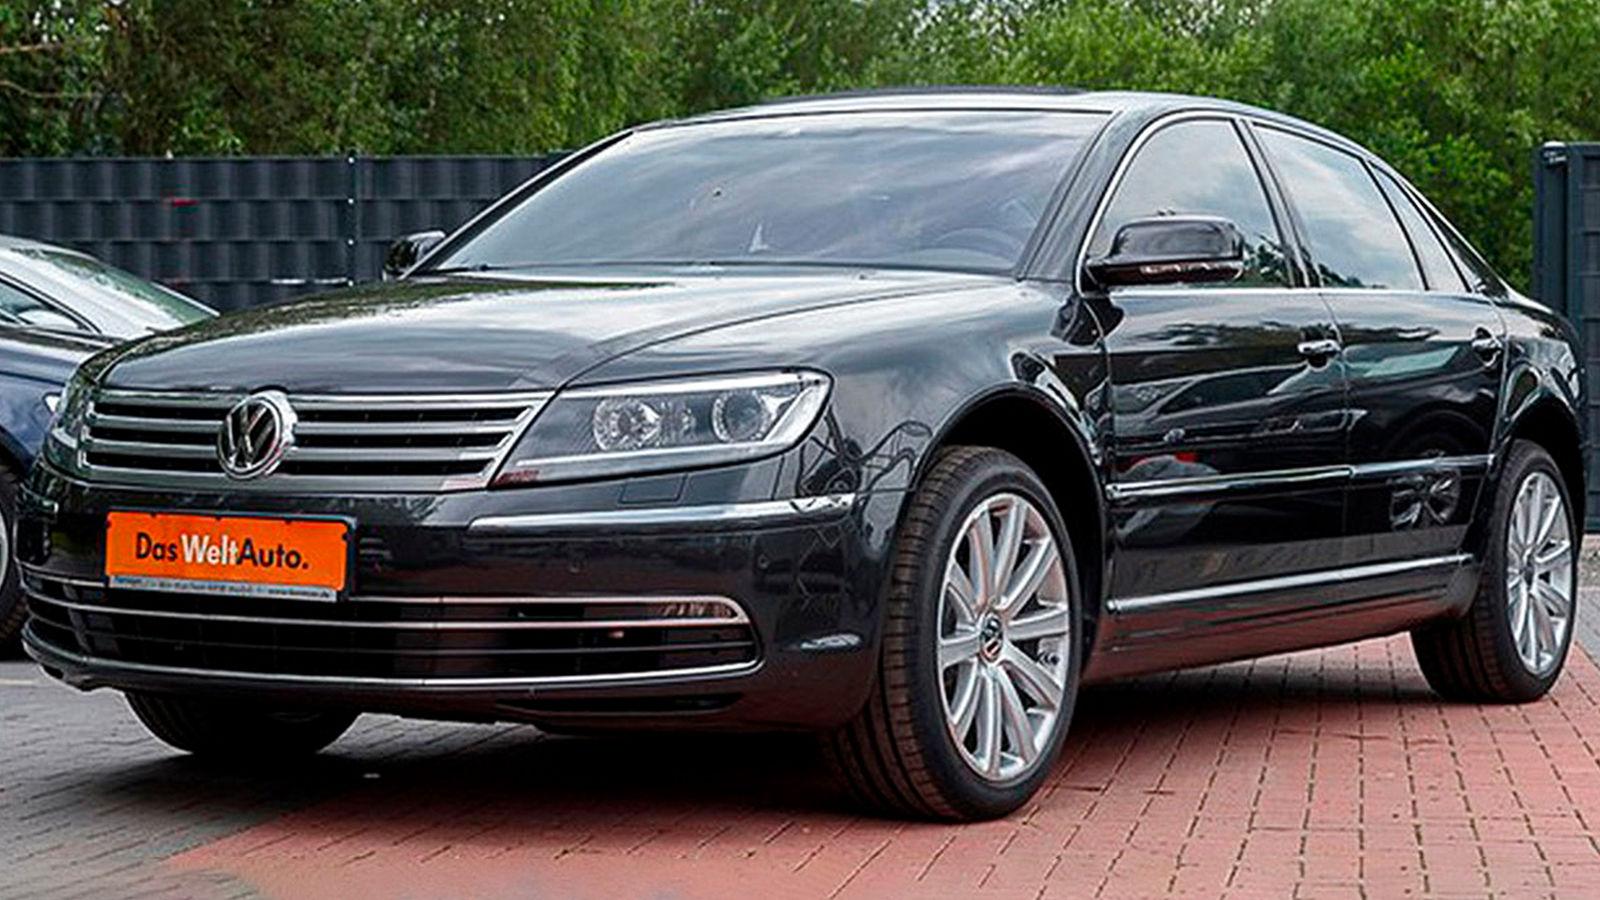 VW Phaeton 4.2 V8 (2015): gebraucht - Preis - Limousine